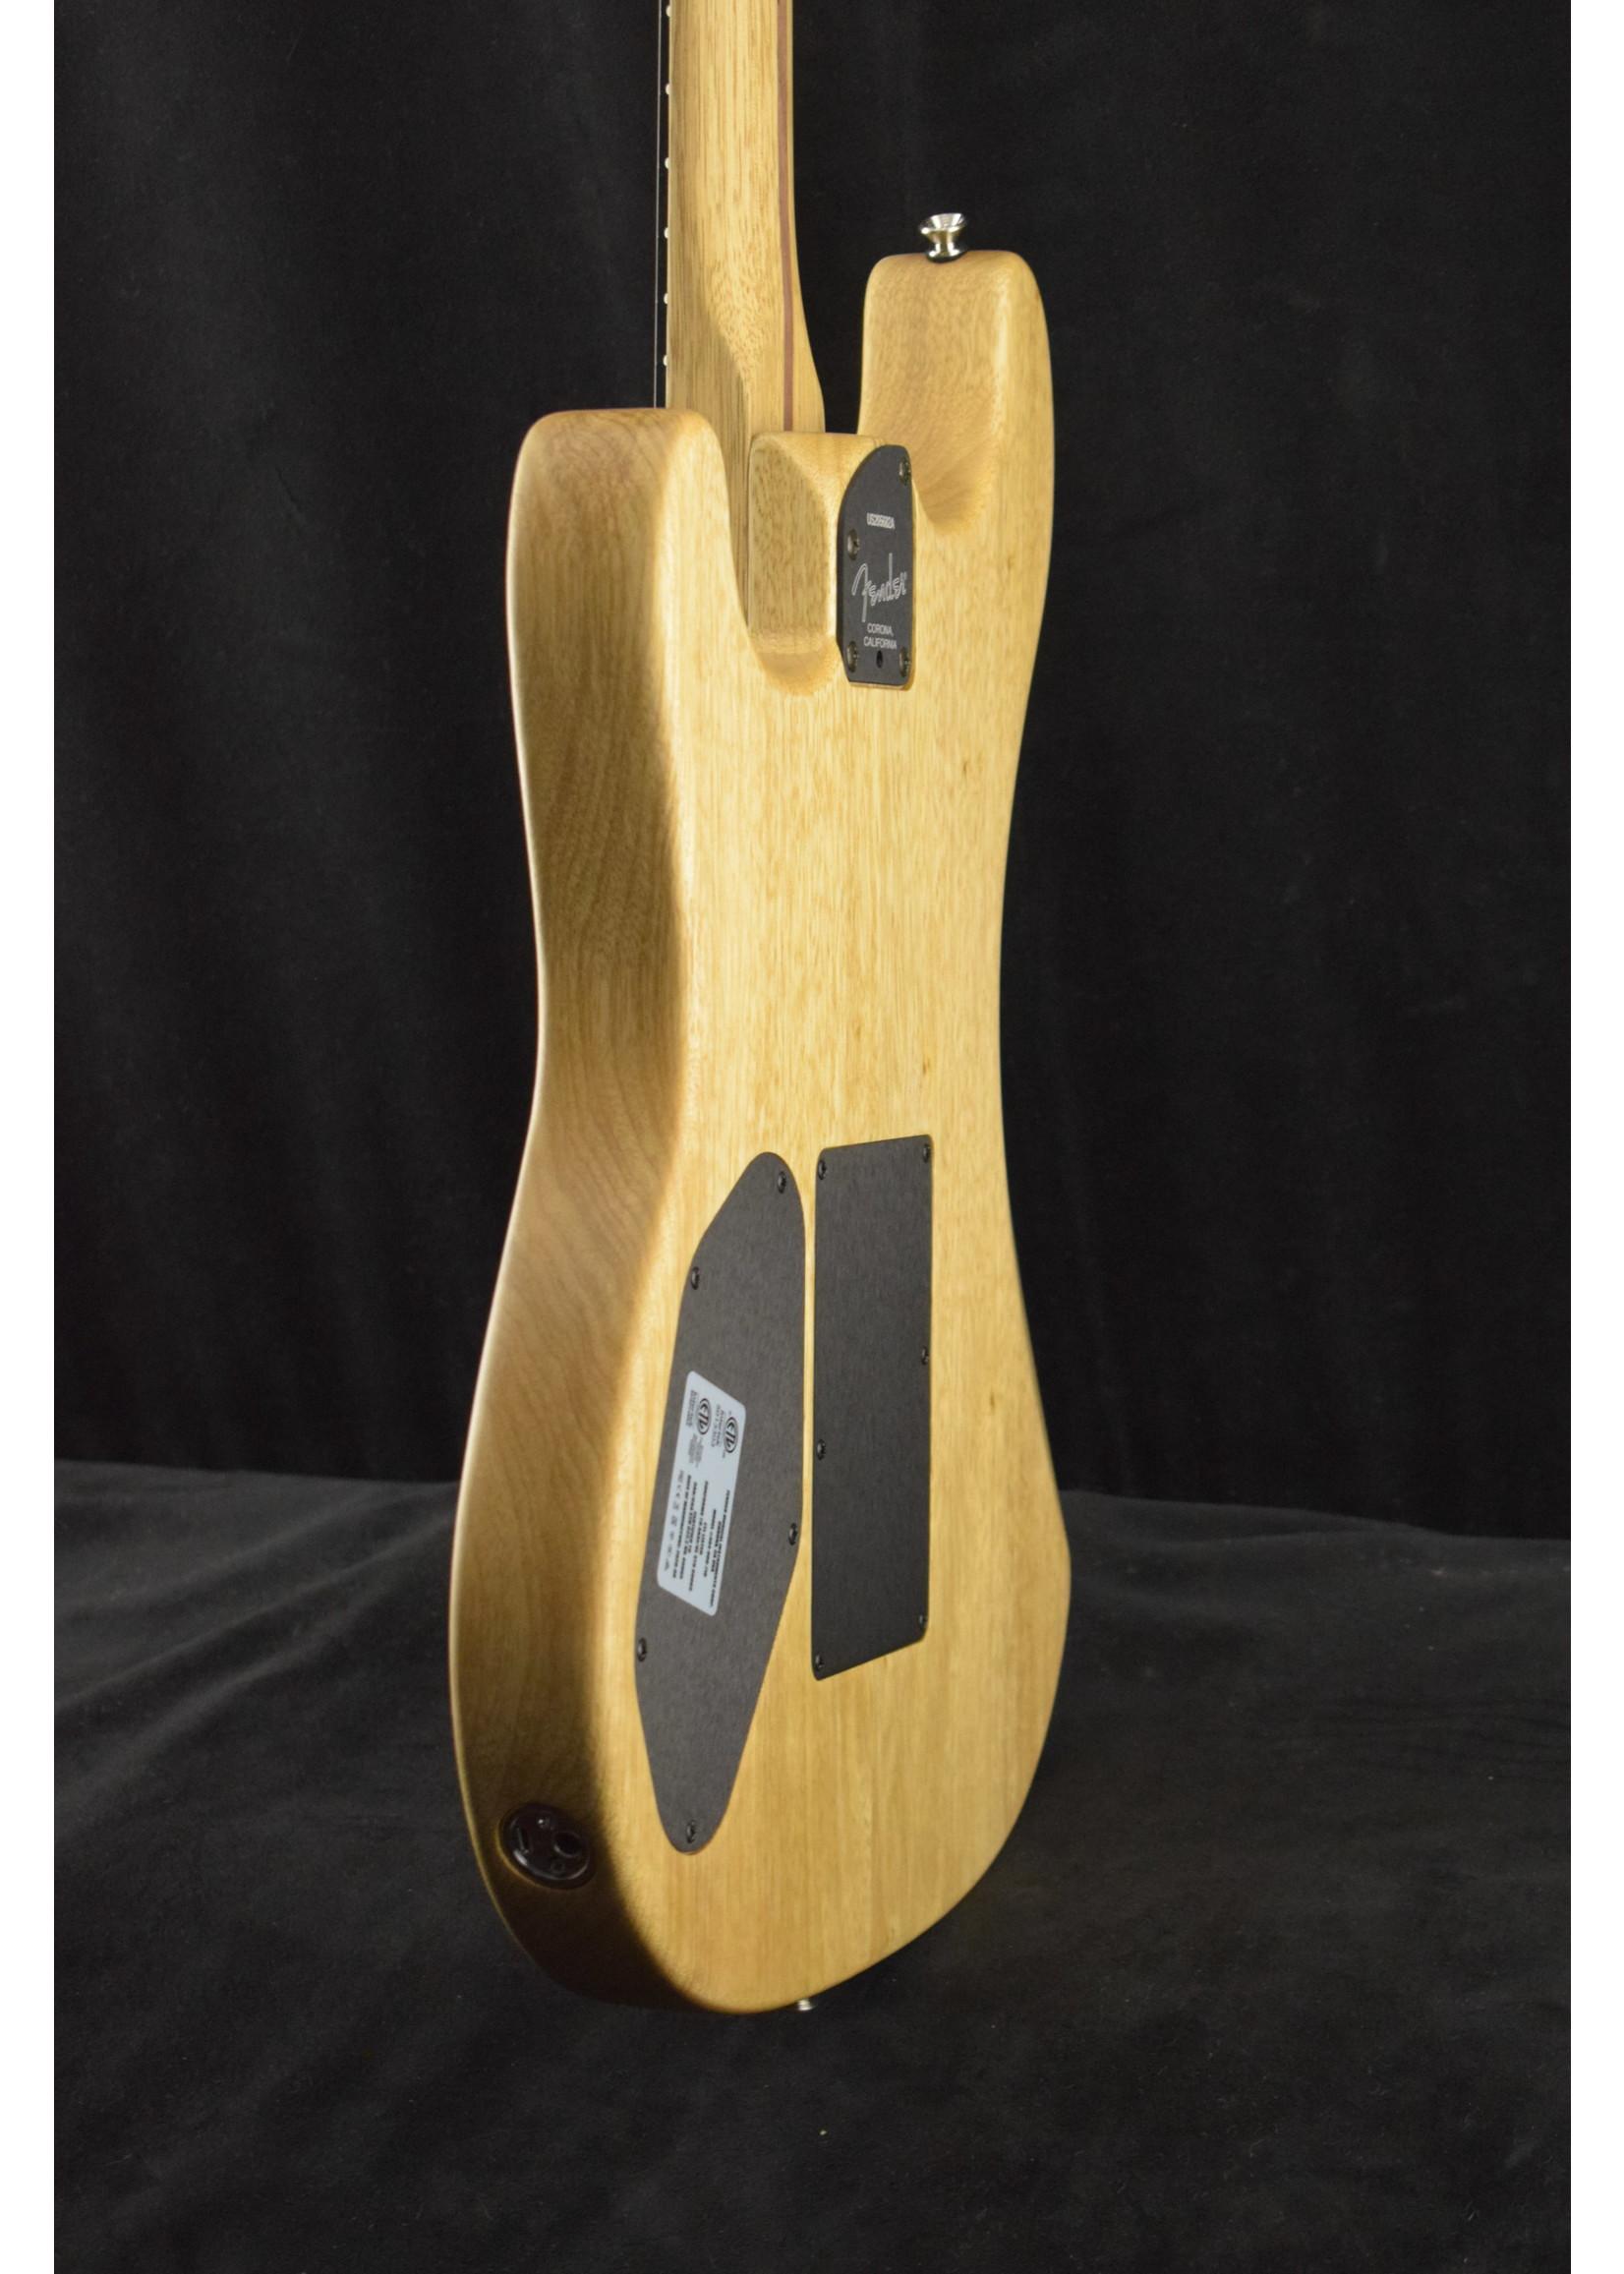 Fender Fender American Acoustasonic Stratocaster EB Cocobolo